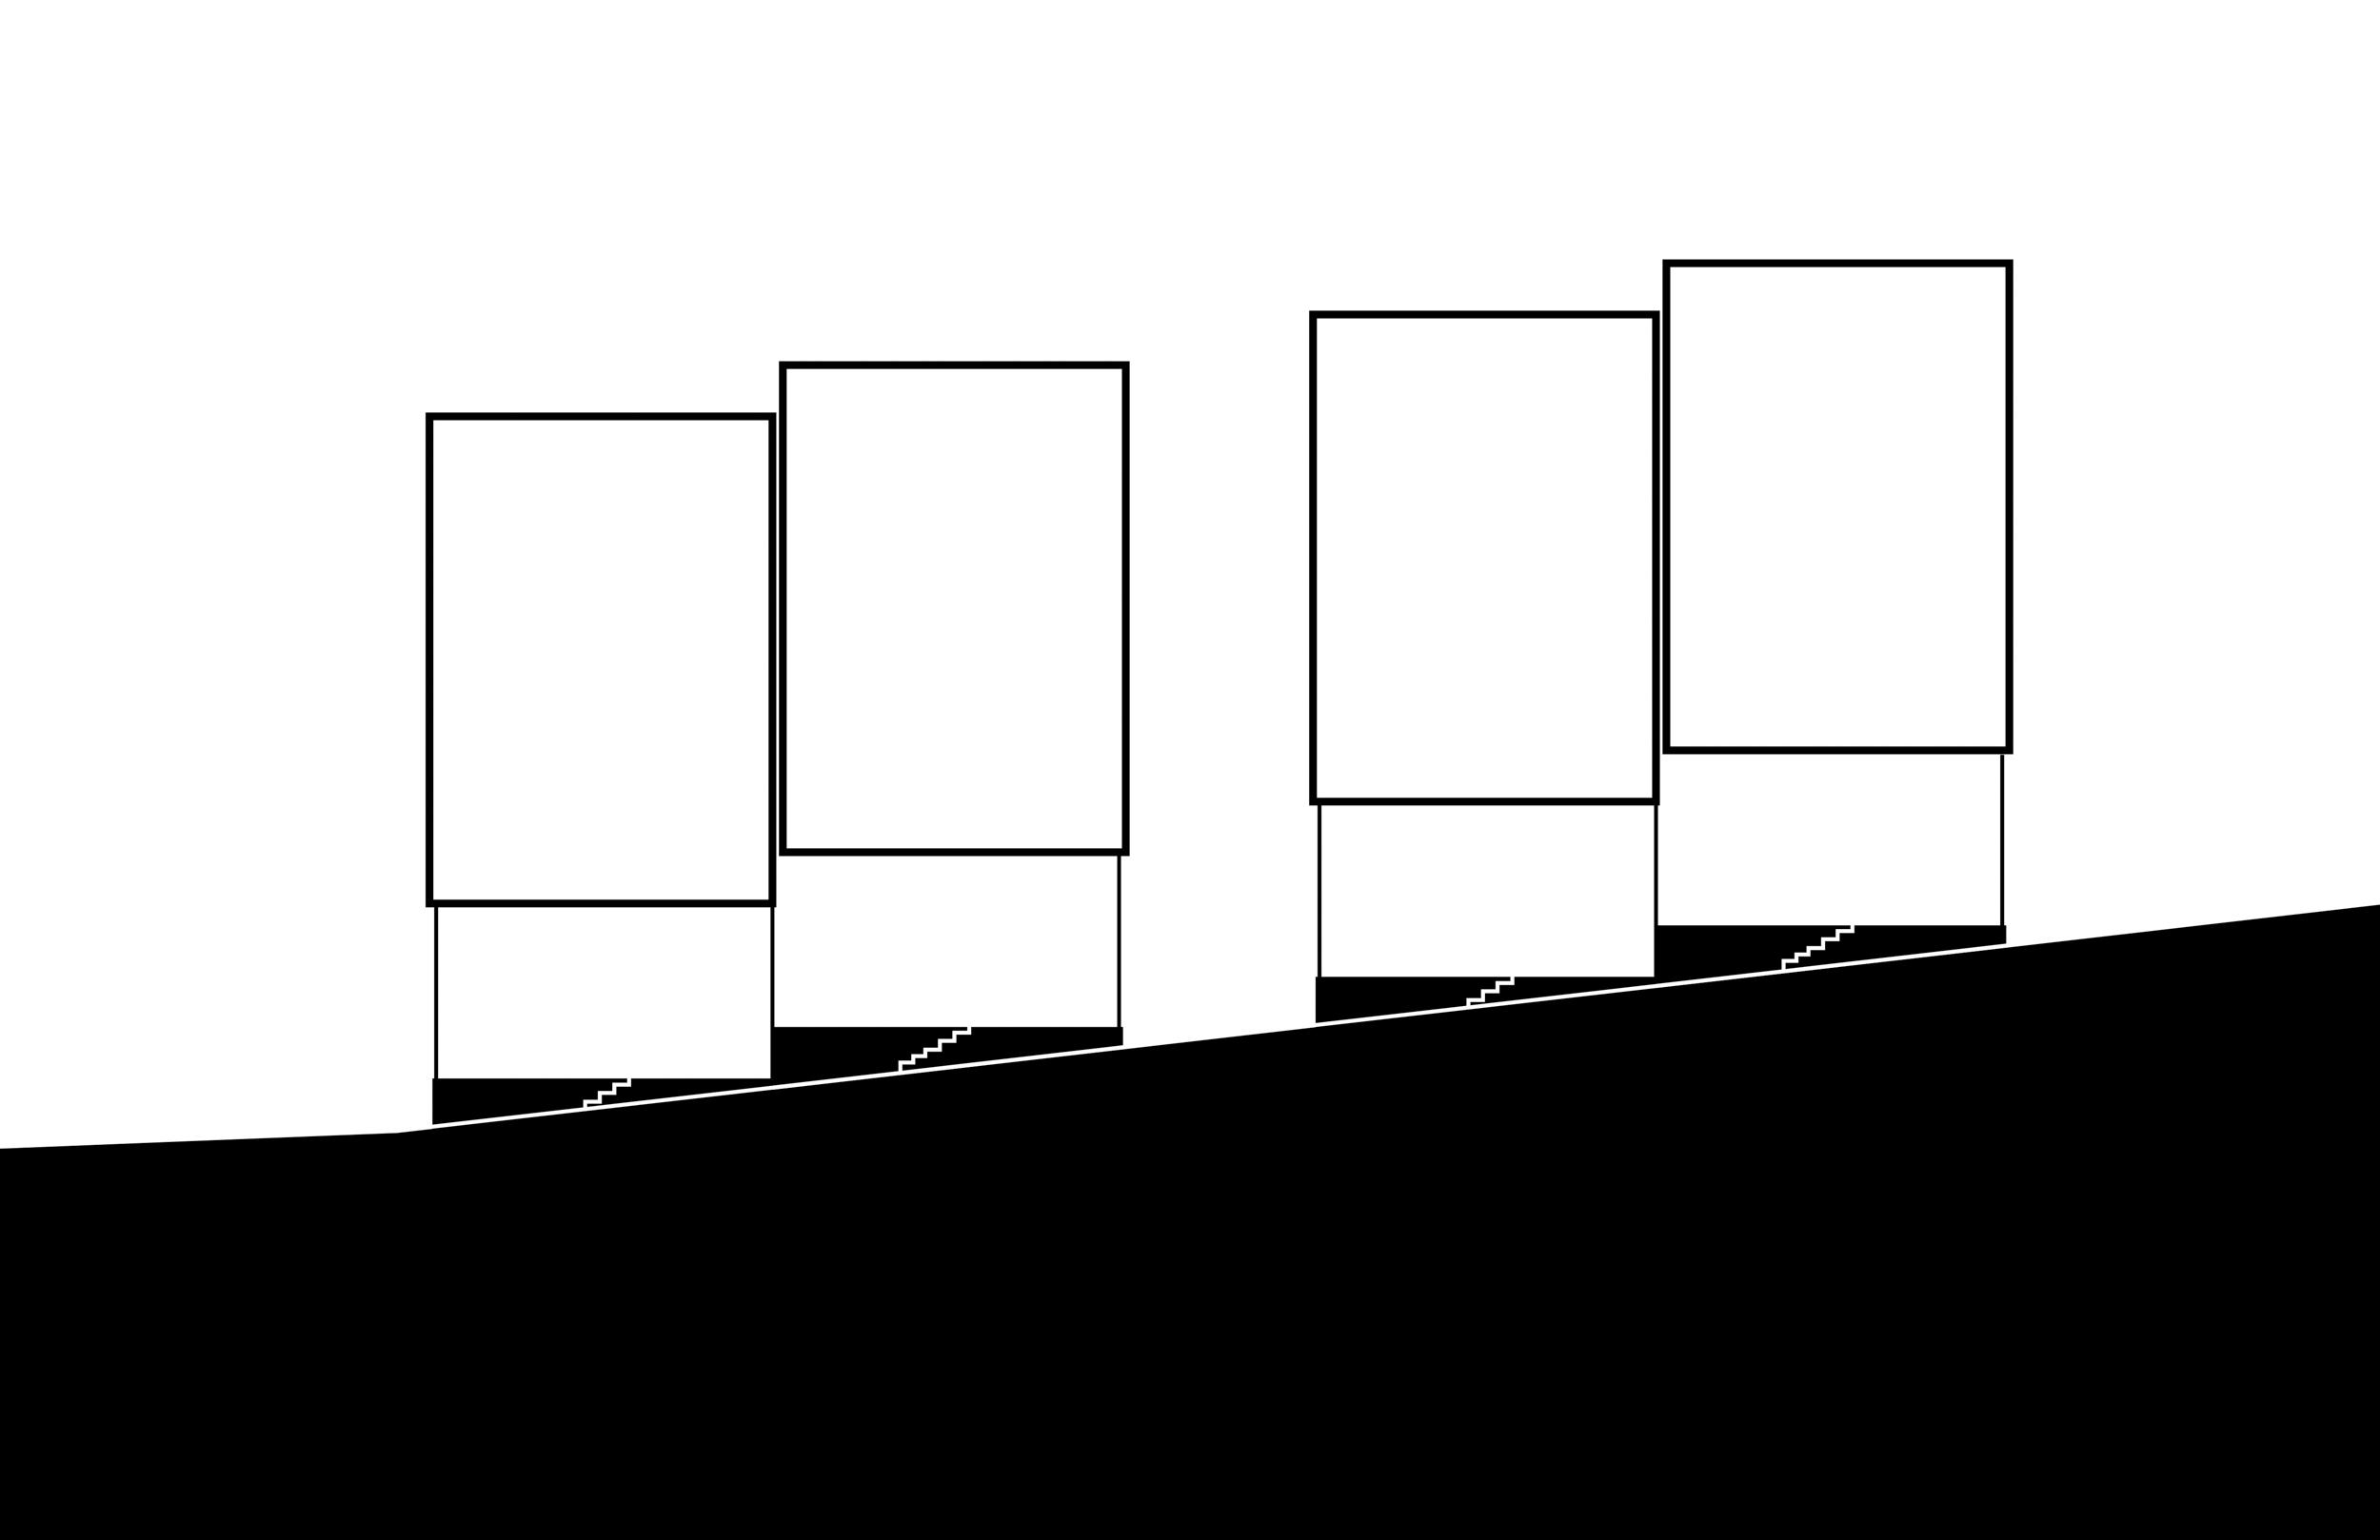 2302 G STREET - Diagram 3.jpg